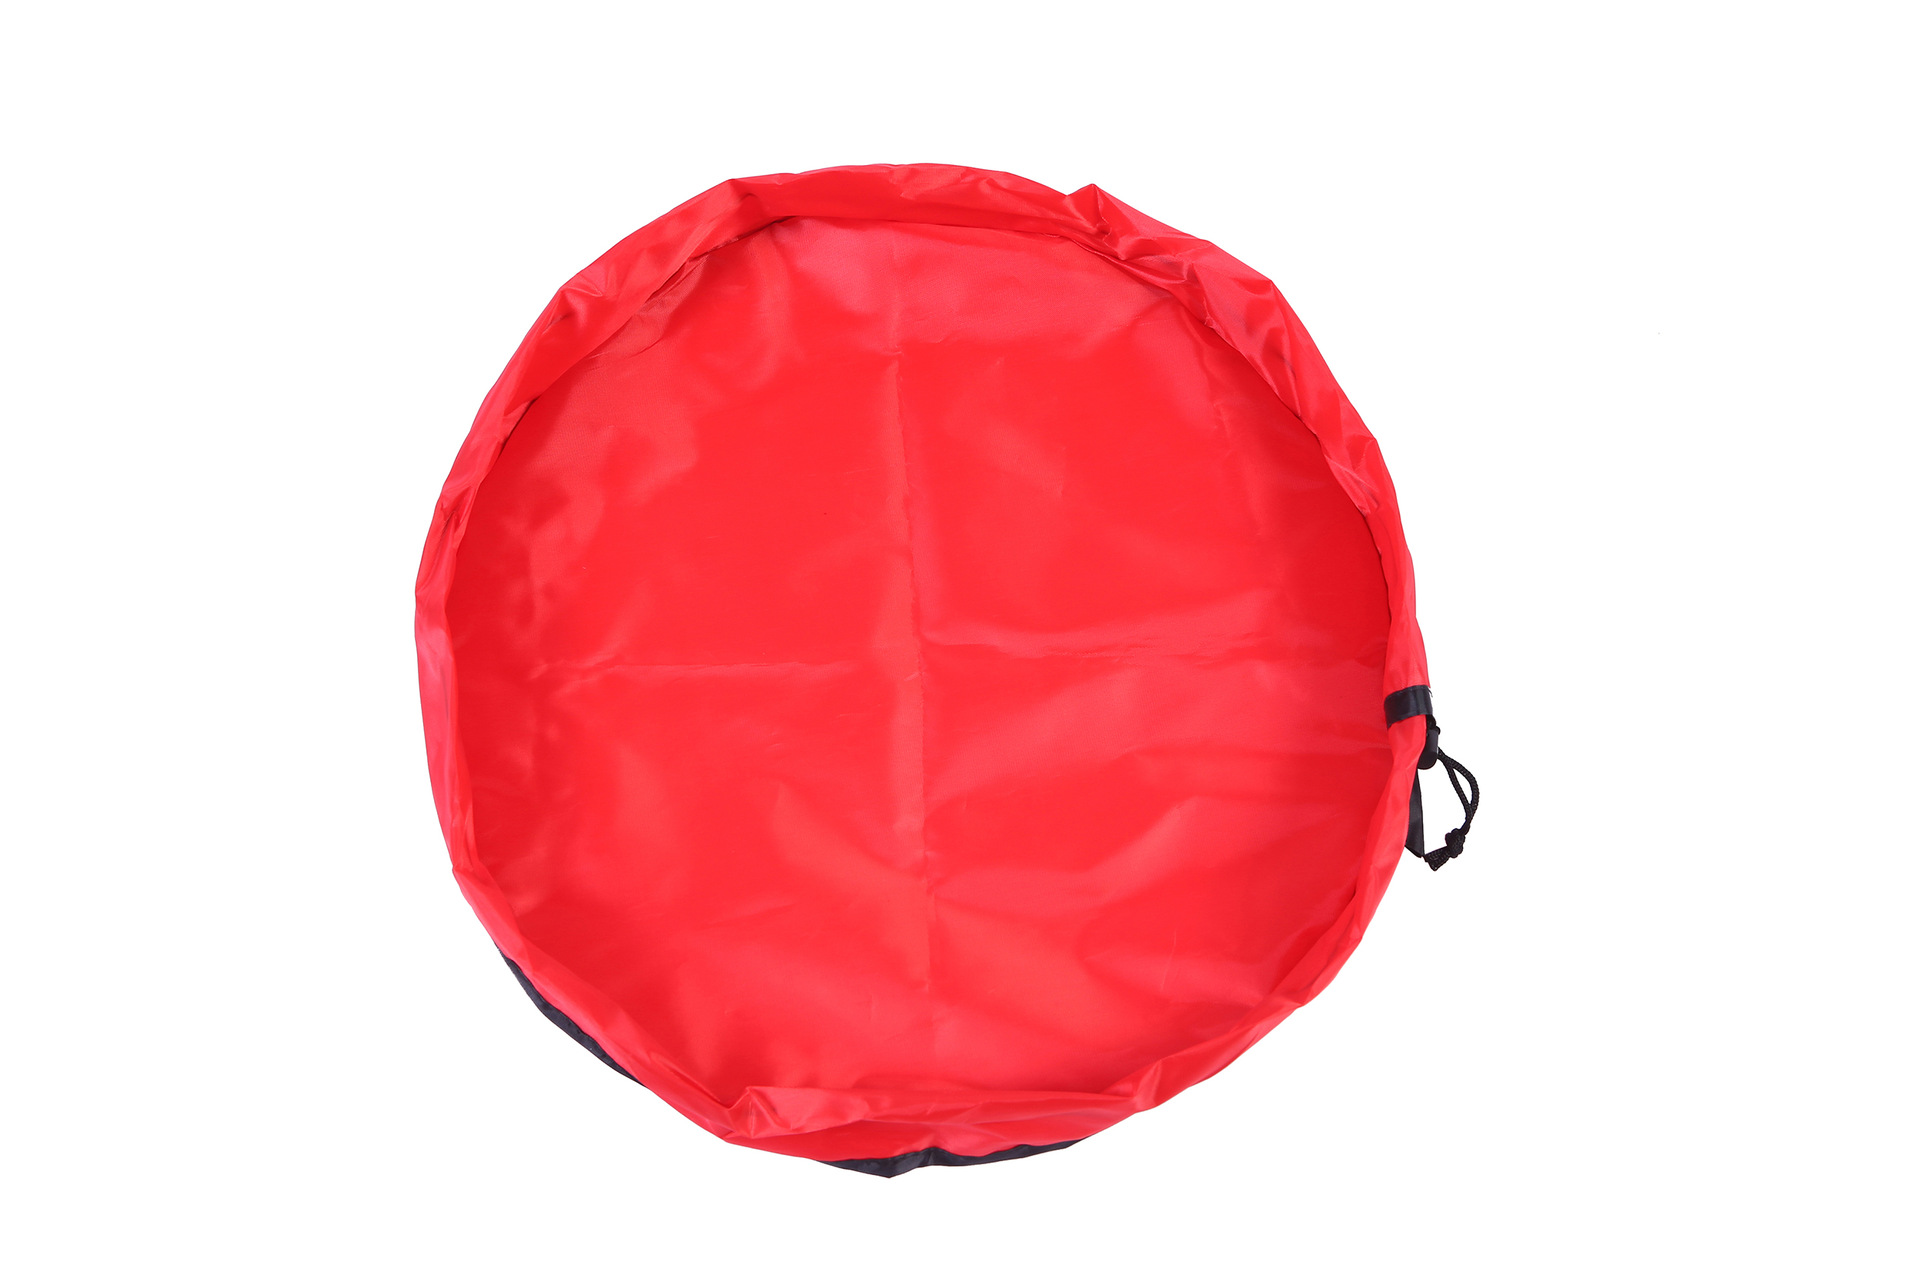 H329d33438e094a4fb4c8d8eaf4d119cc3 2020 Multifunctional baby toy fast storage bag play mat outdoor children's waterproof toy mat beam storage bag beach mat